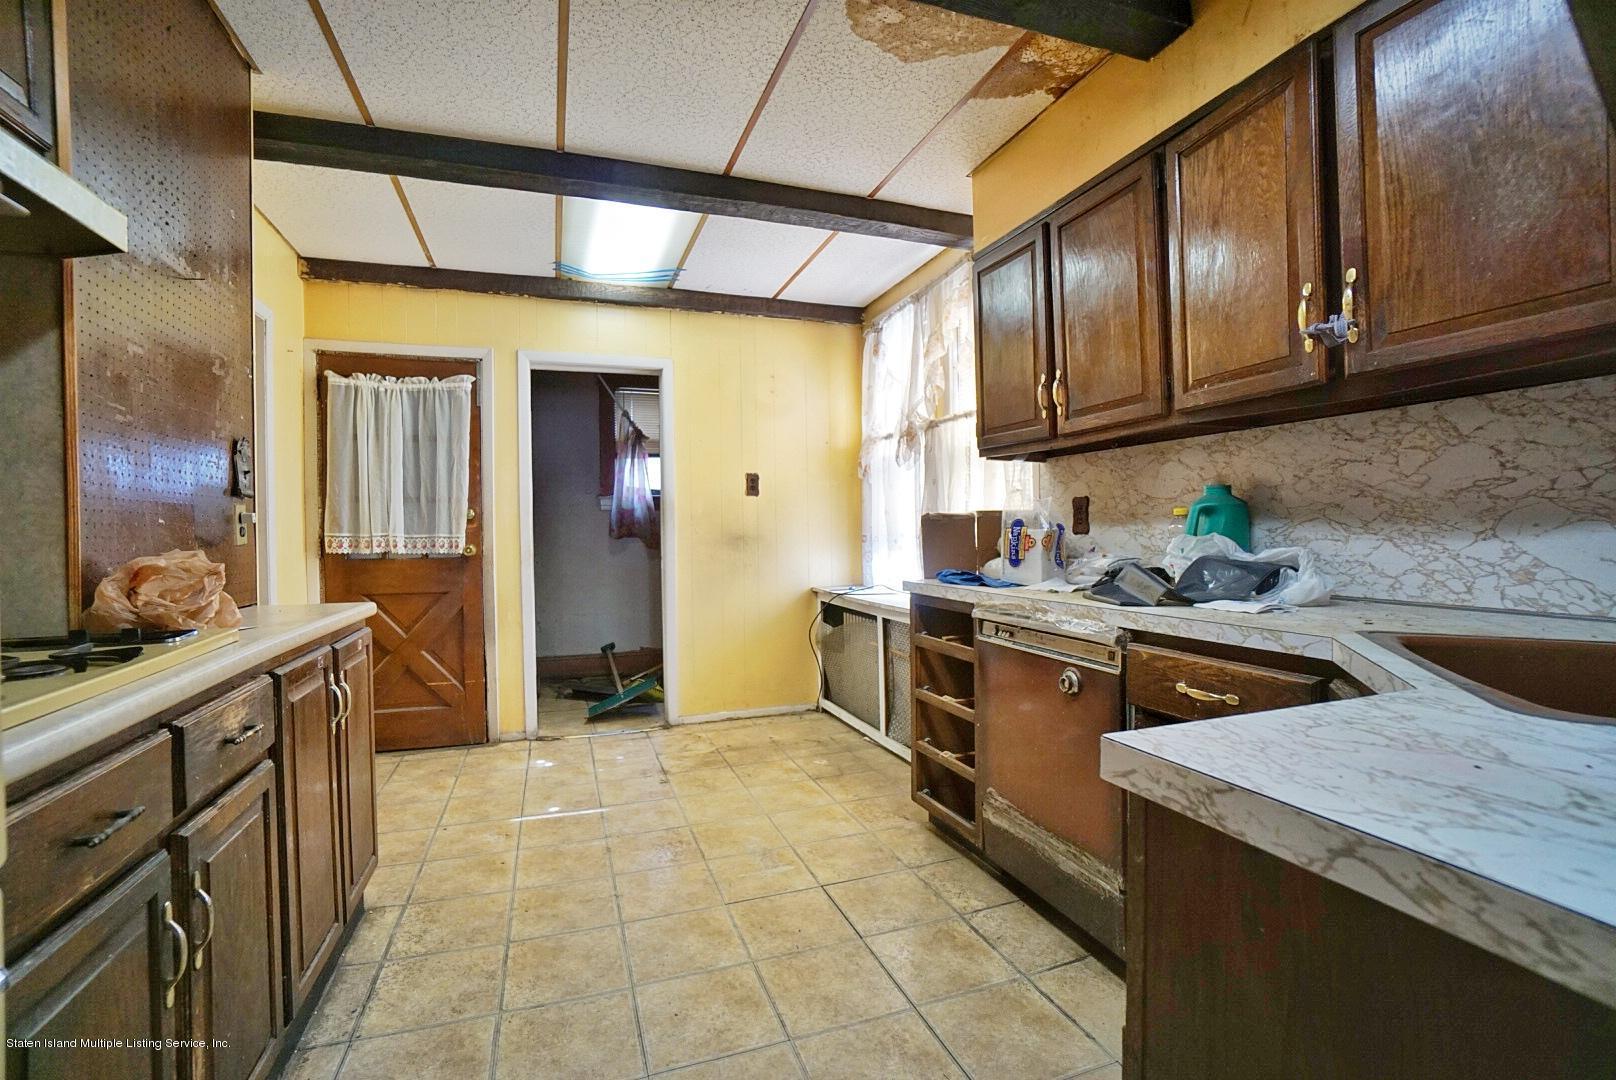 Single Family - Detached 33 Lafayette Avenue  Staten Island, NY 10301, MLS-1127009-12